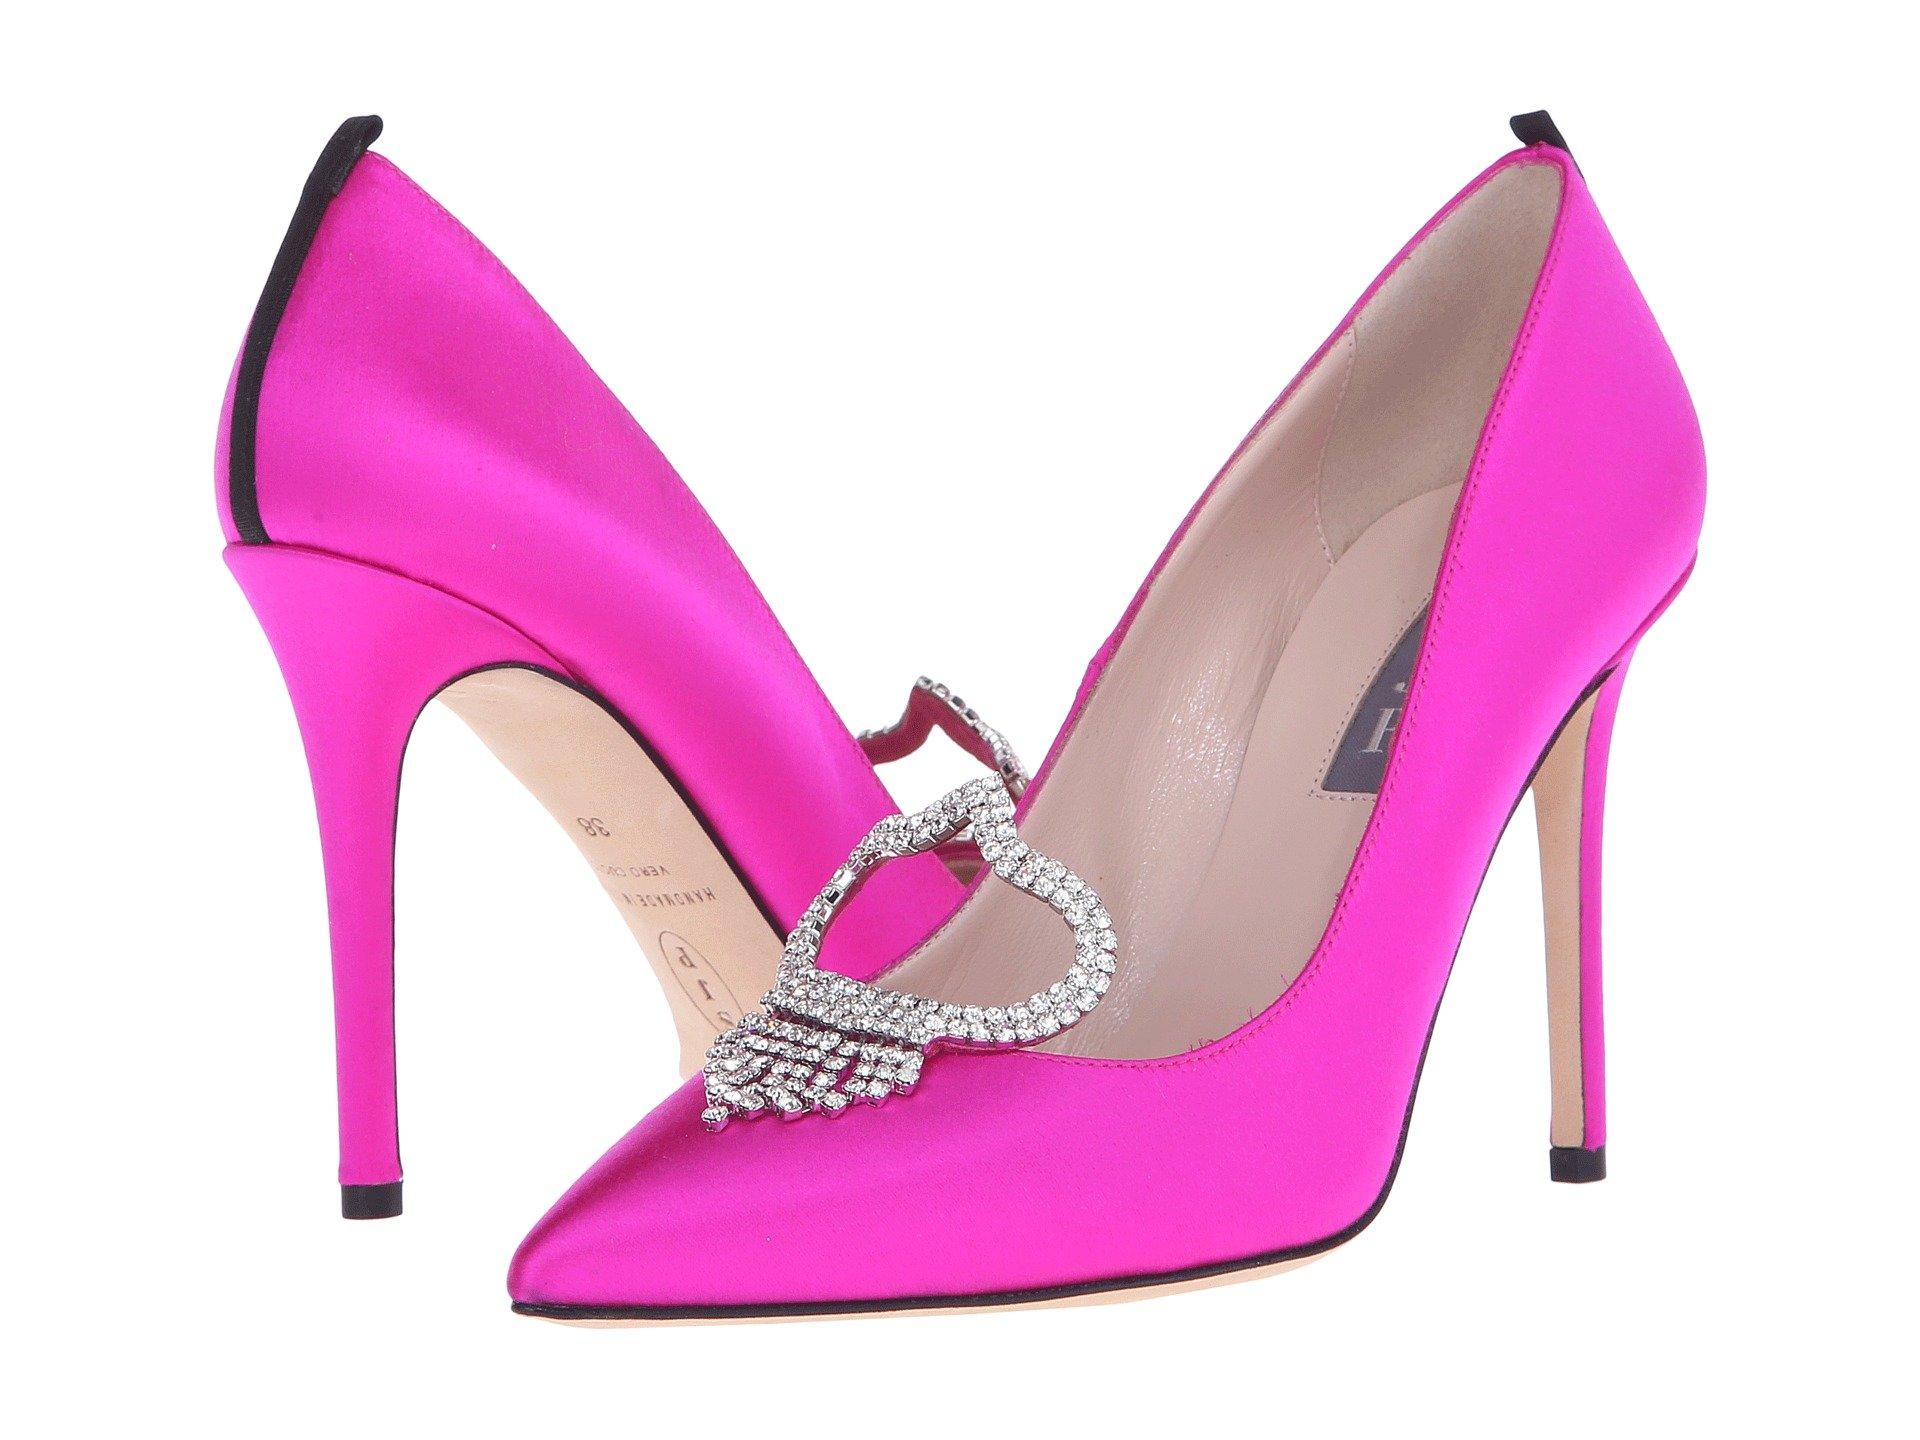 Charlotte, Candy Pink Satin